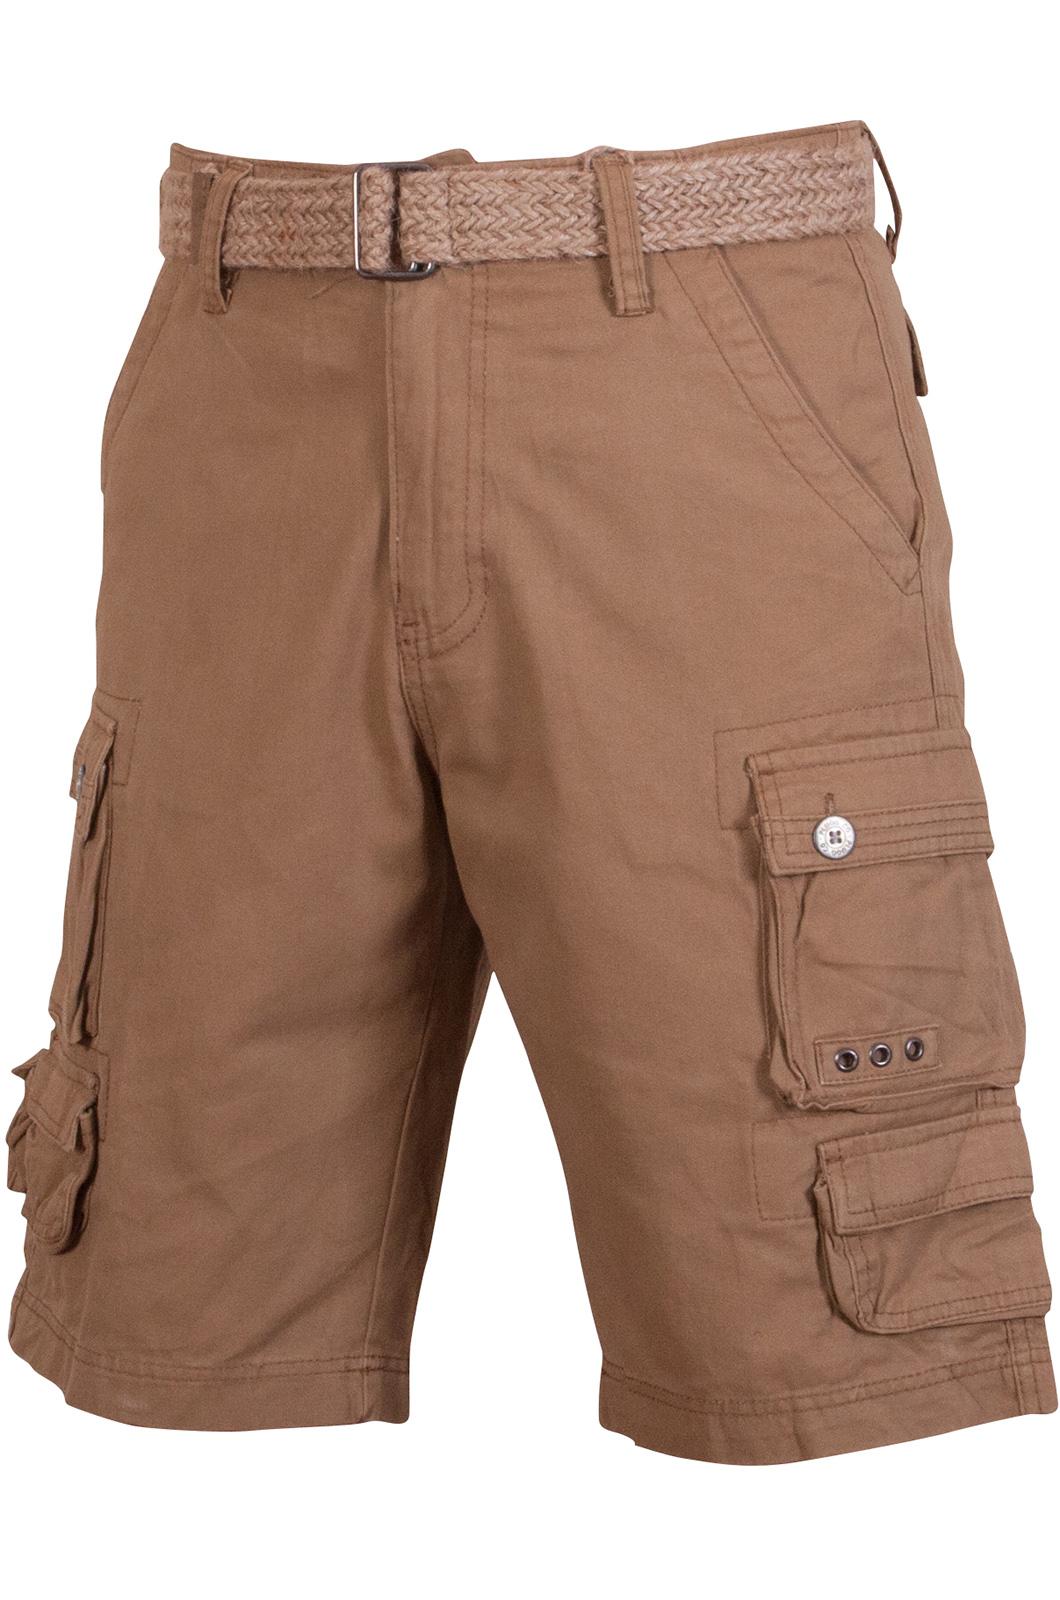 Мужские шорты карго